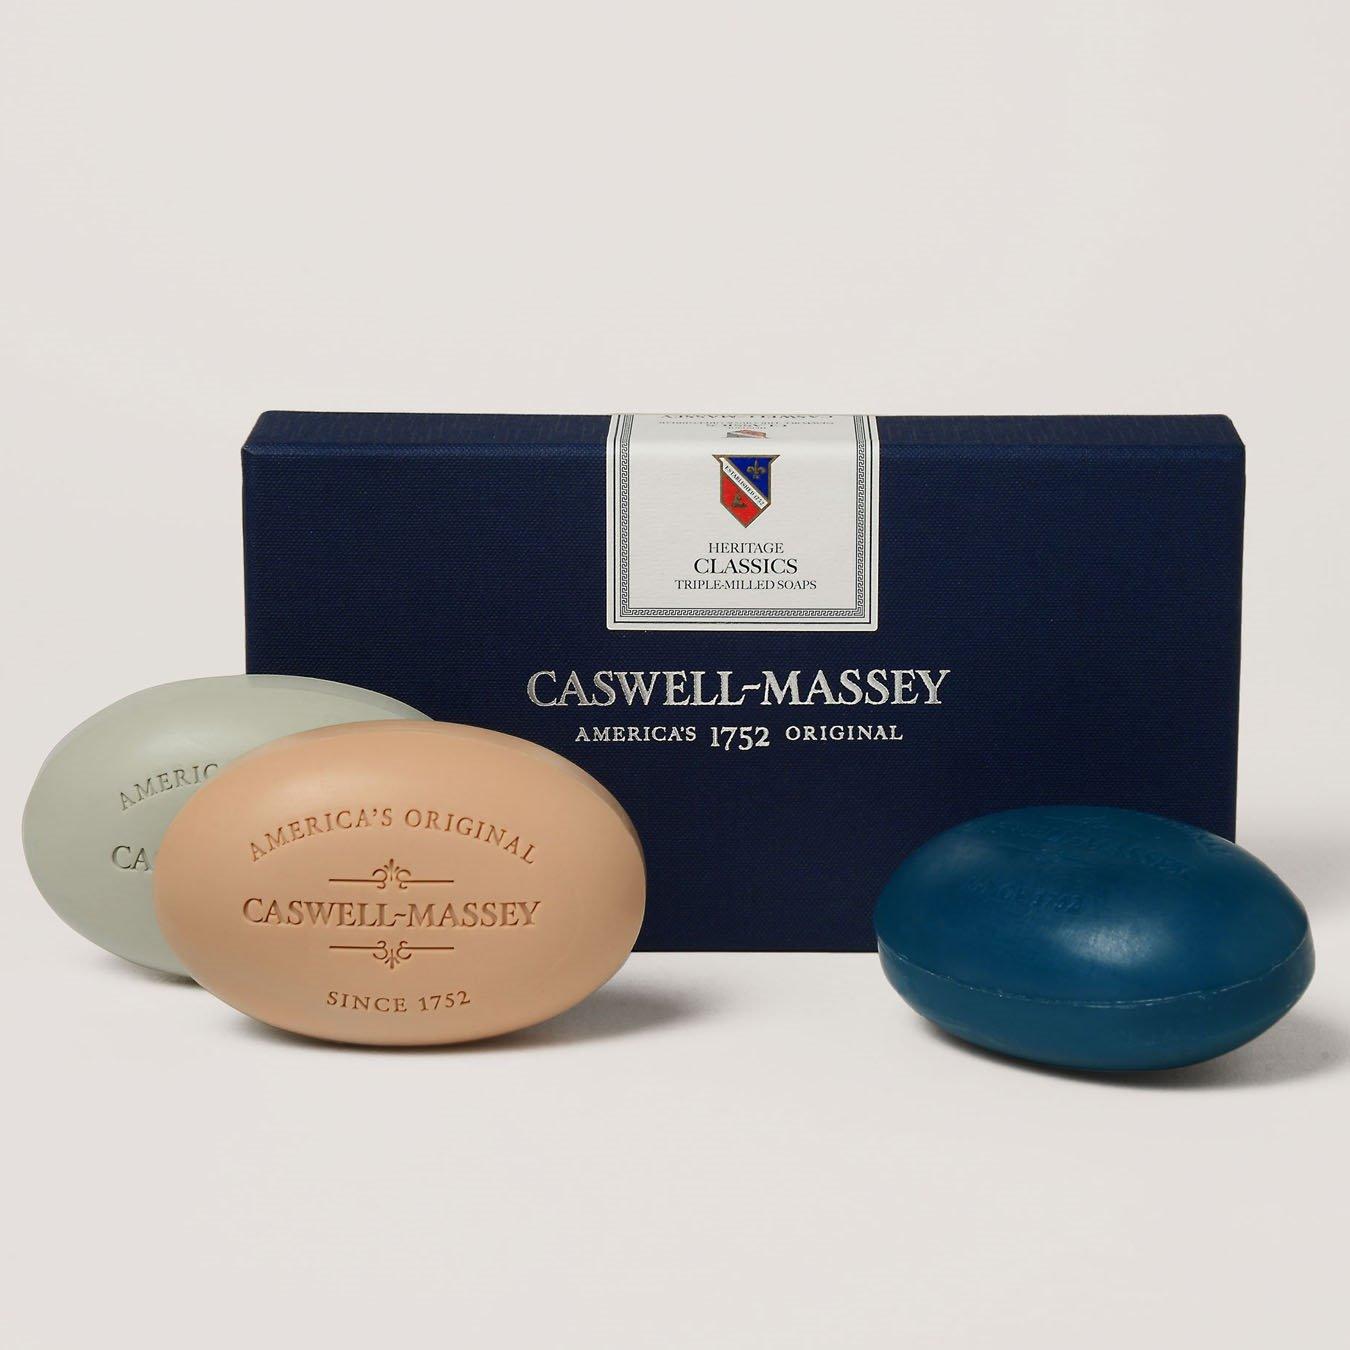 Caswell-Massey Men's Classic Soap Set